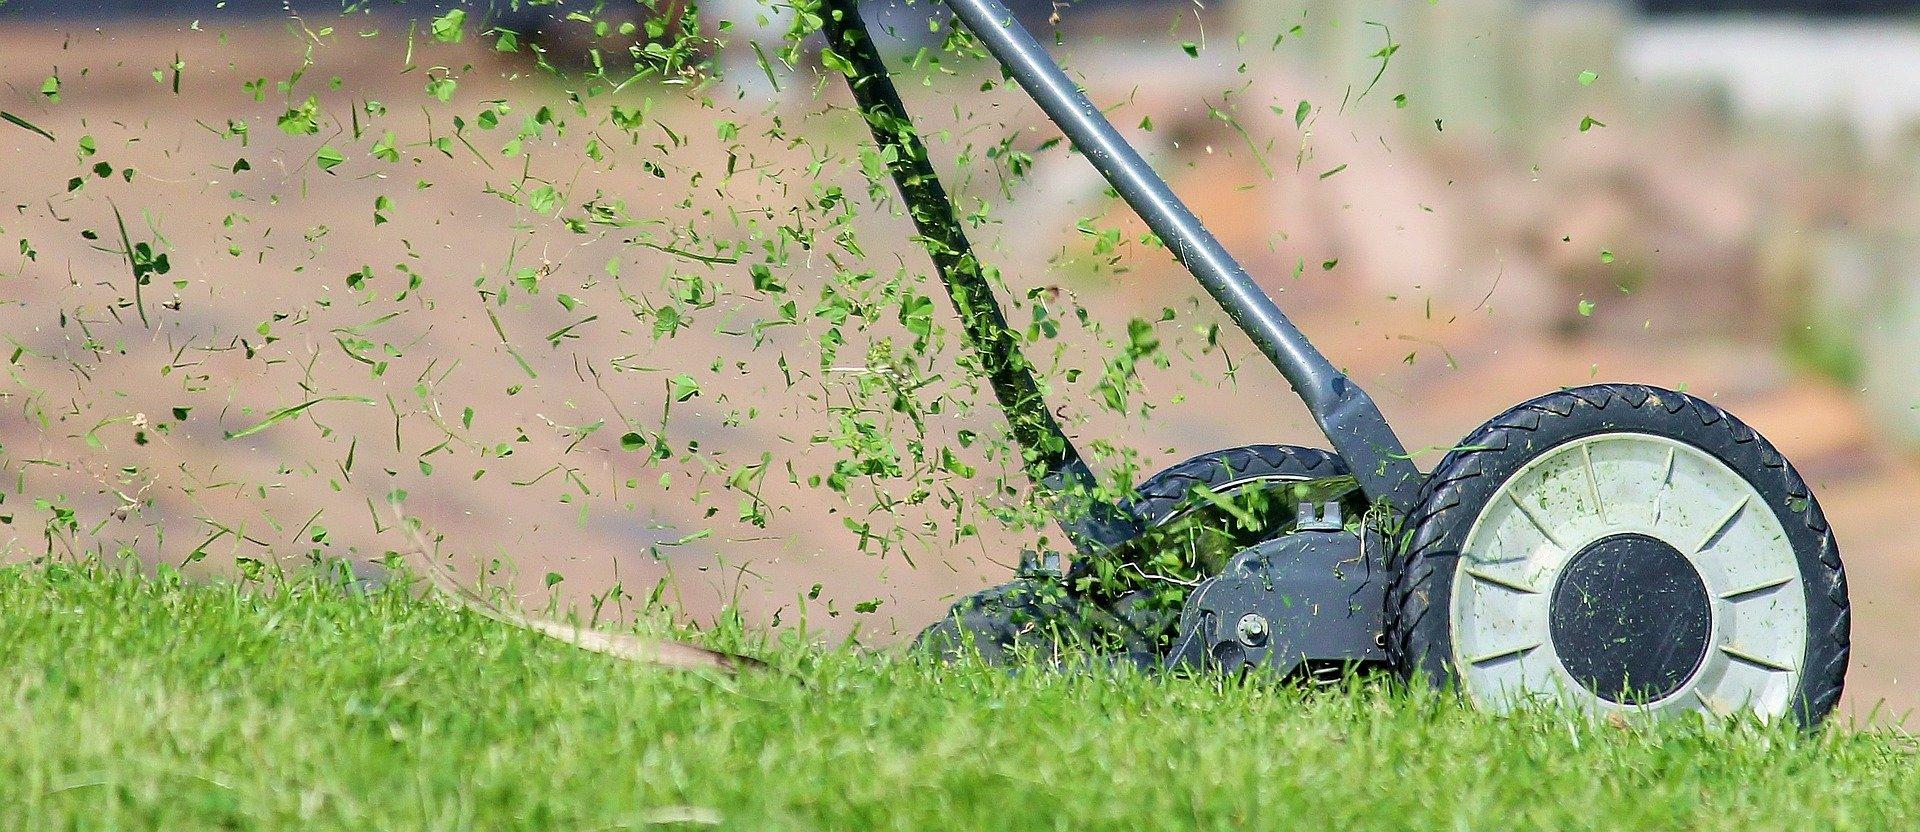 Footpath Grass Cutting Tender 2021